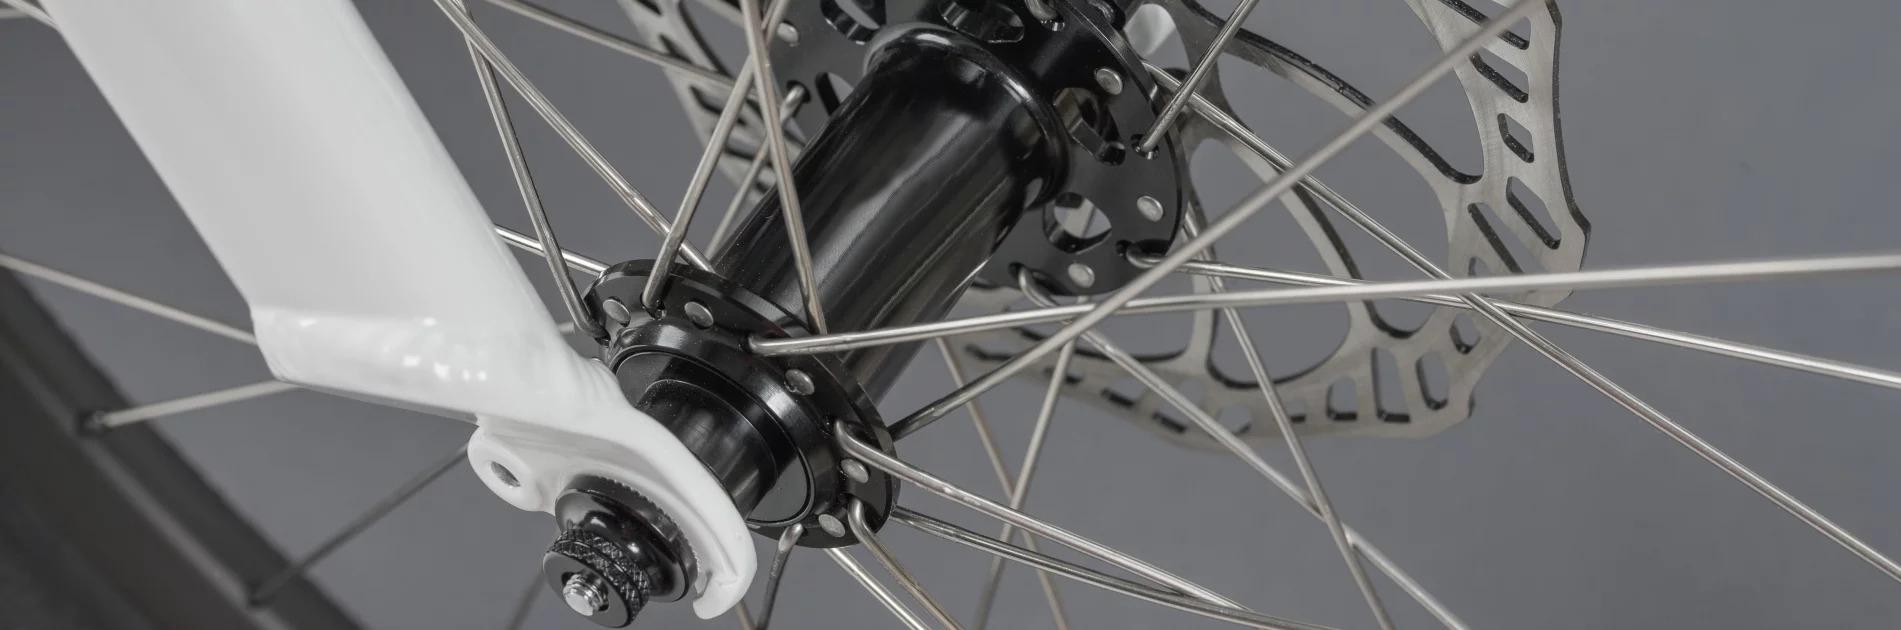 Radnabe an unserem ben-e-bike TWENTY Kinder-E-Bike